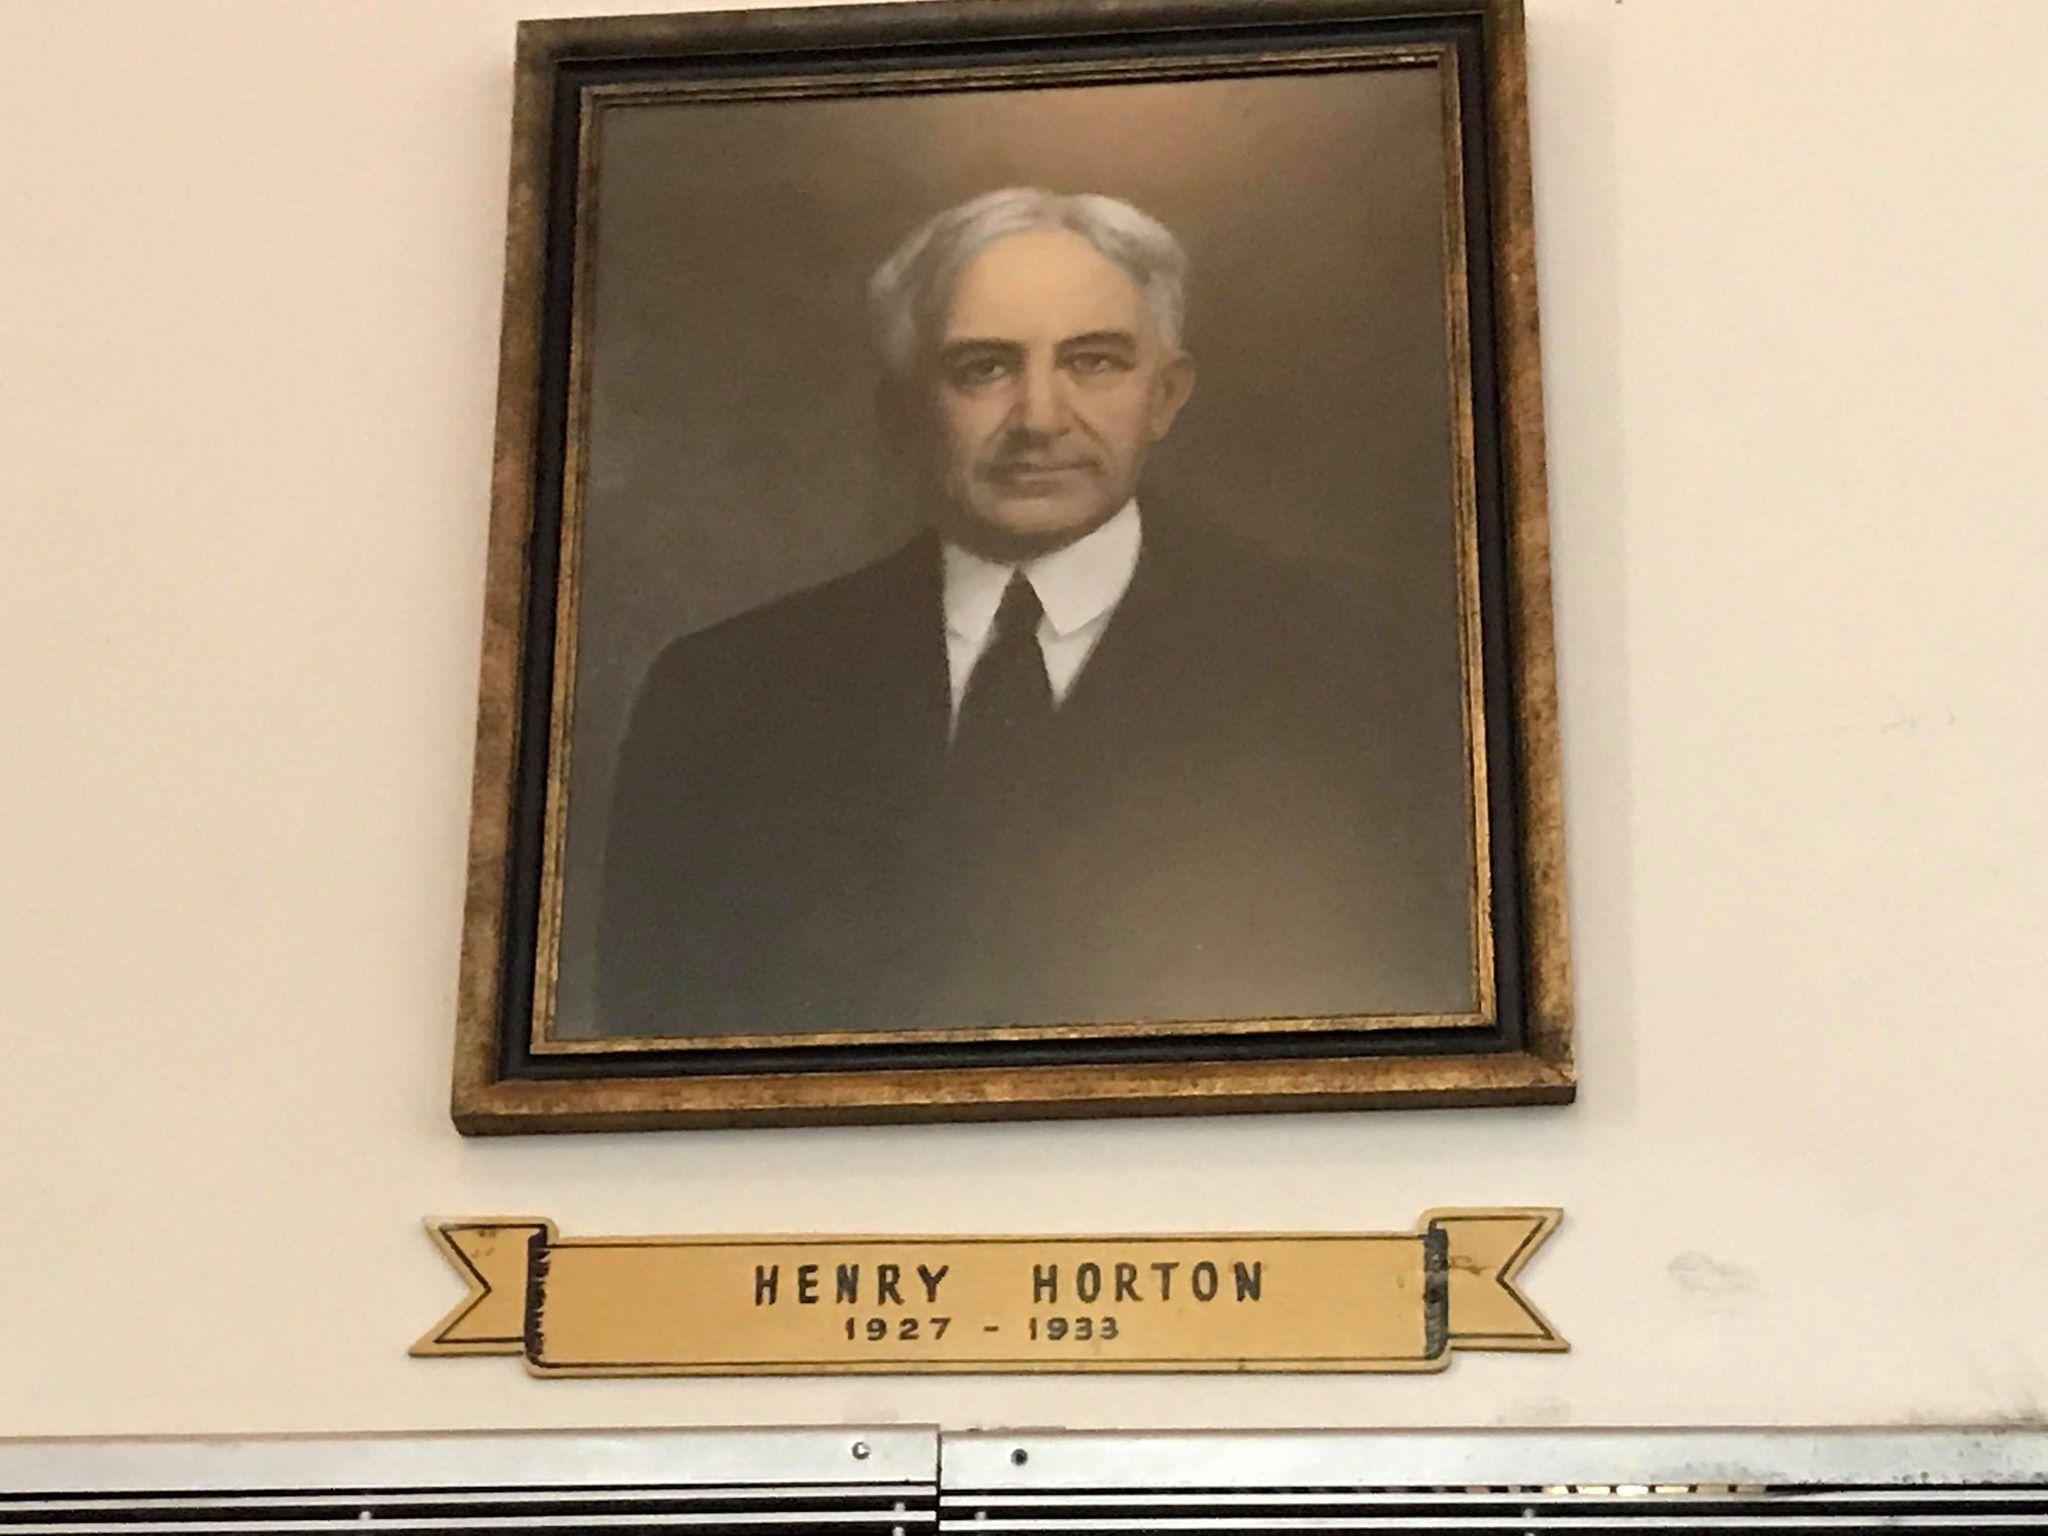 Henry Horton